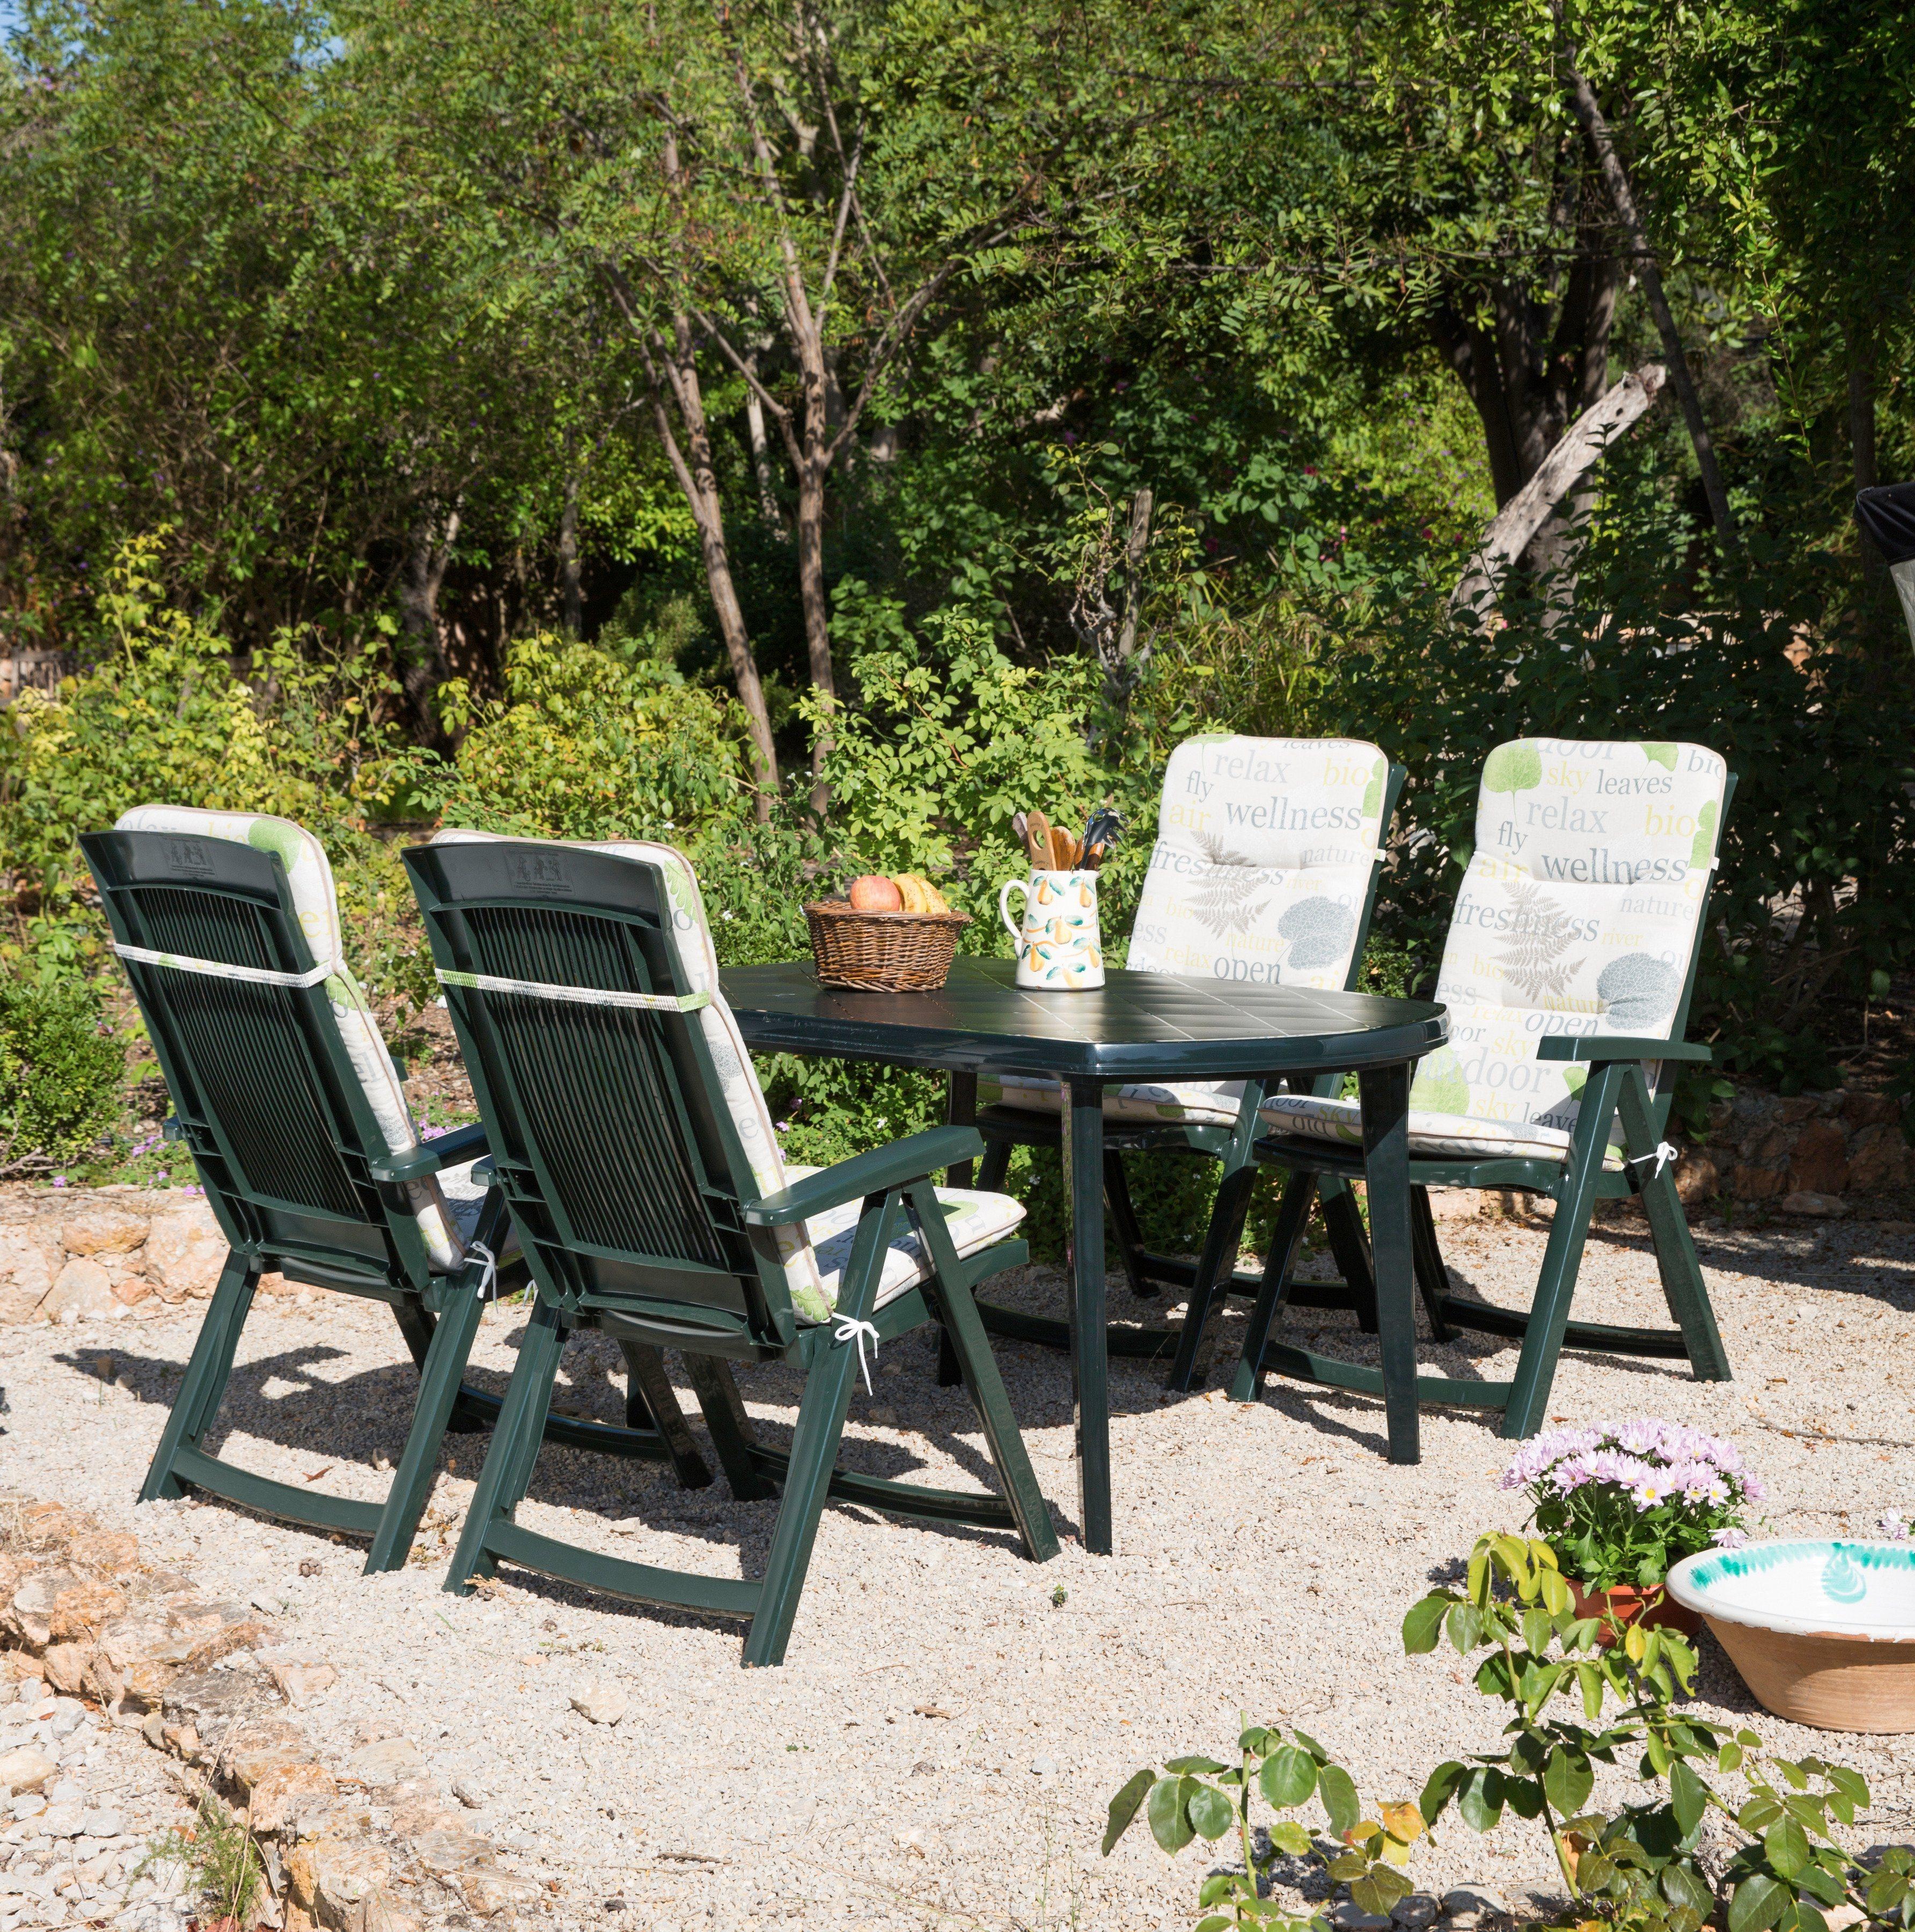 Gartenmöbelset »Elise«, 4 Klappsessel, Tisch 137x90 Cm, Kunststoff, Grün